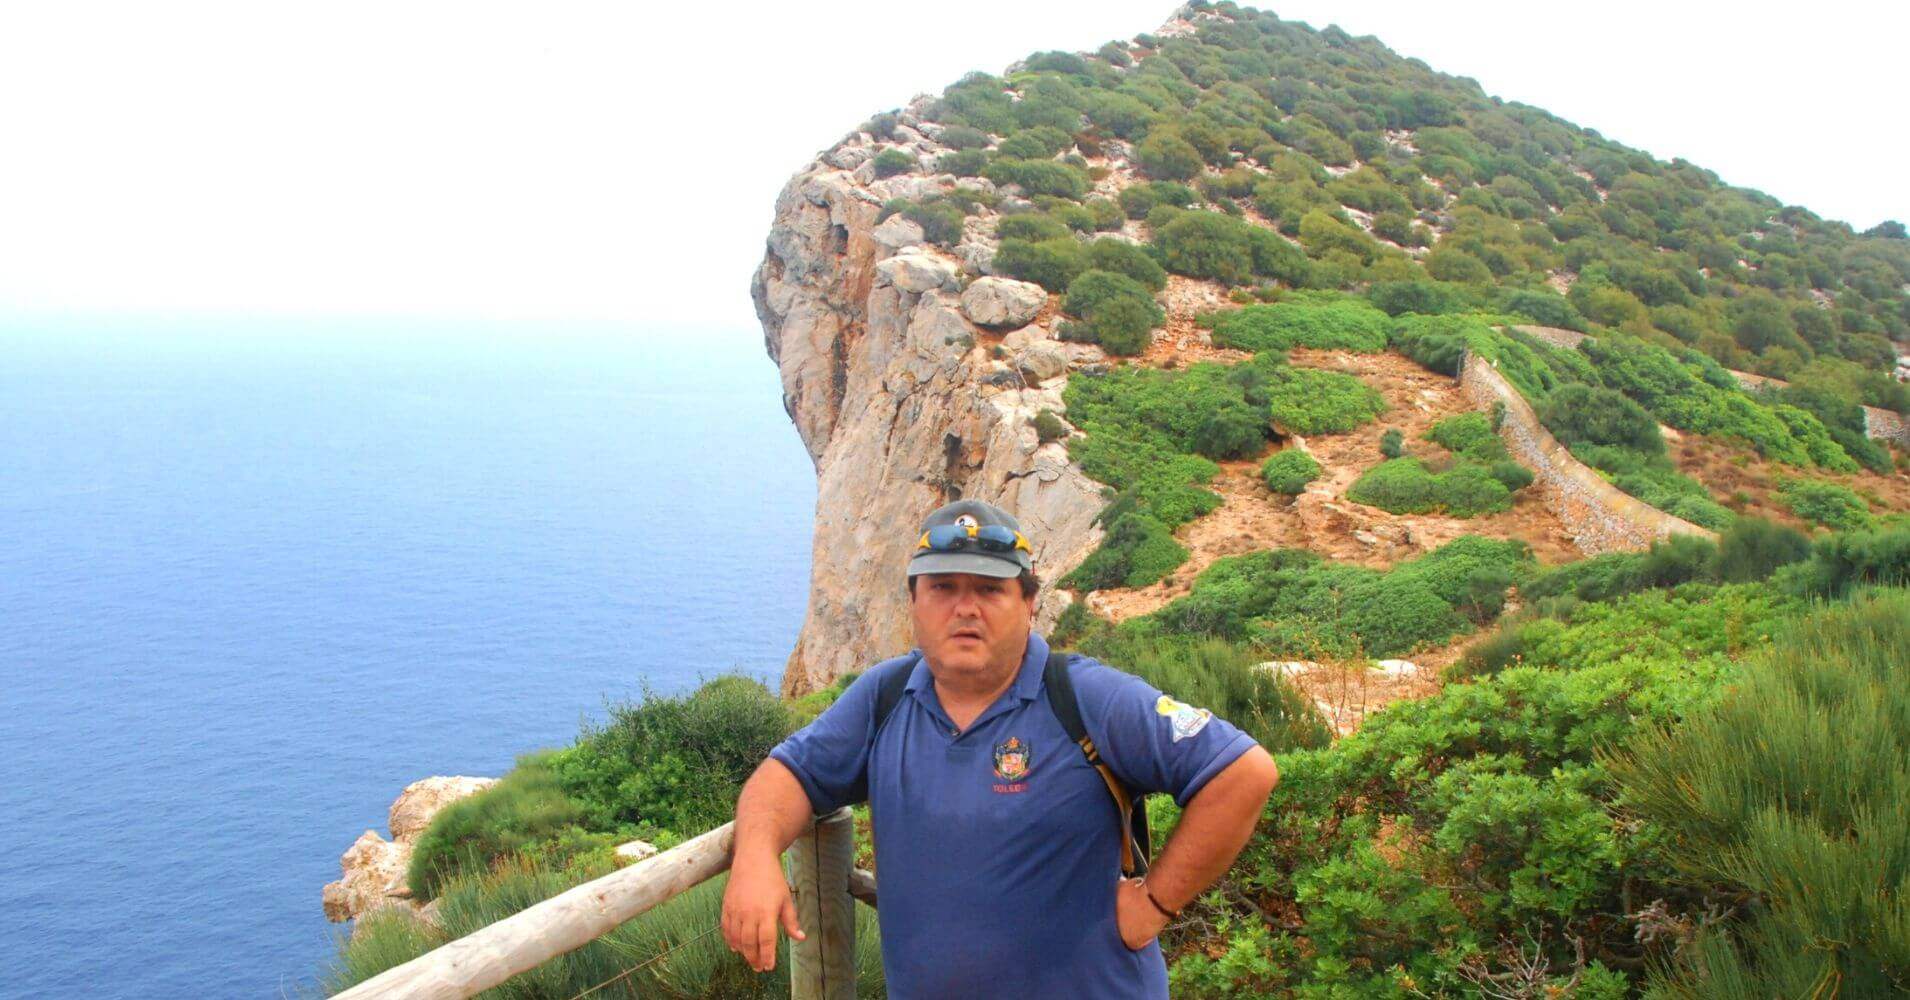 Faro Vell. Isla de Dragonera. Islas Baleares.